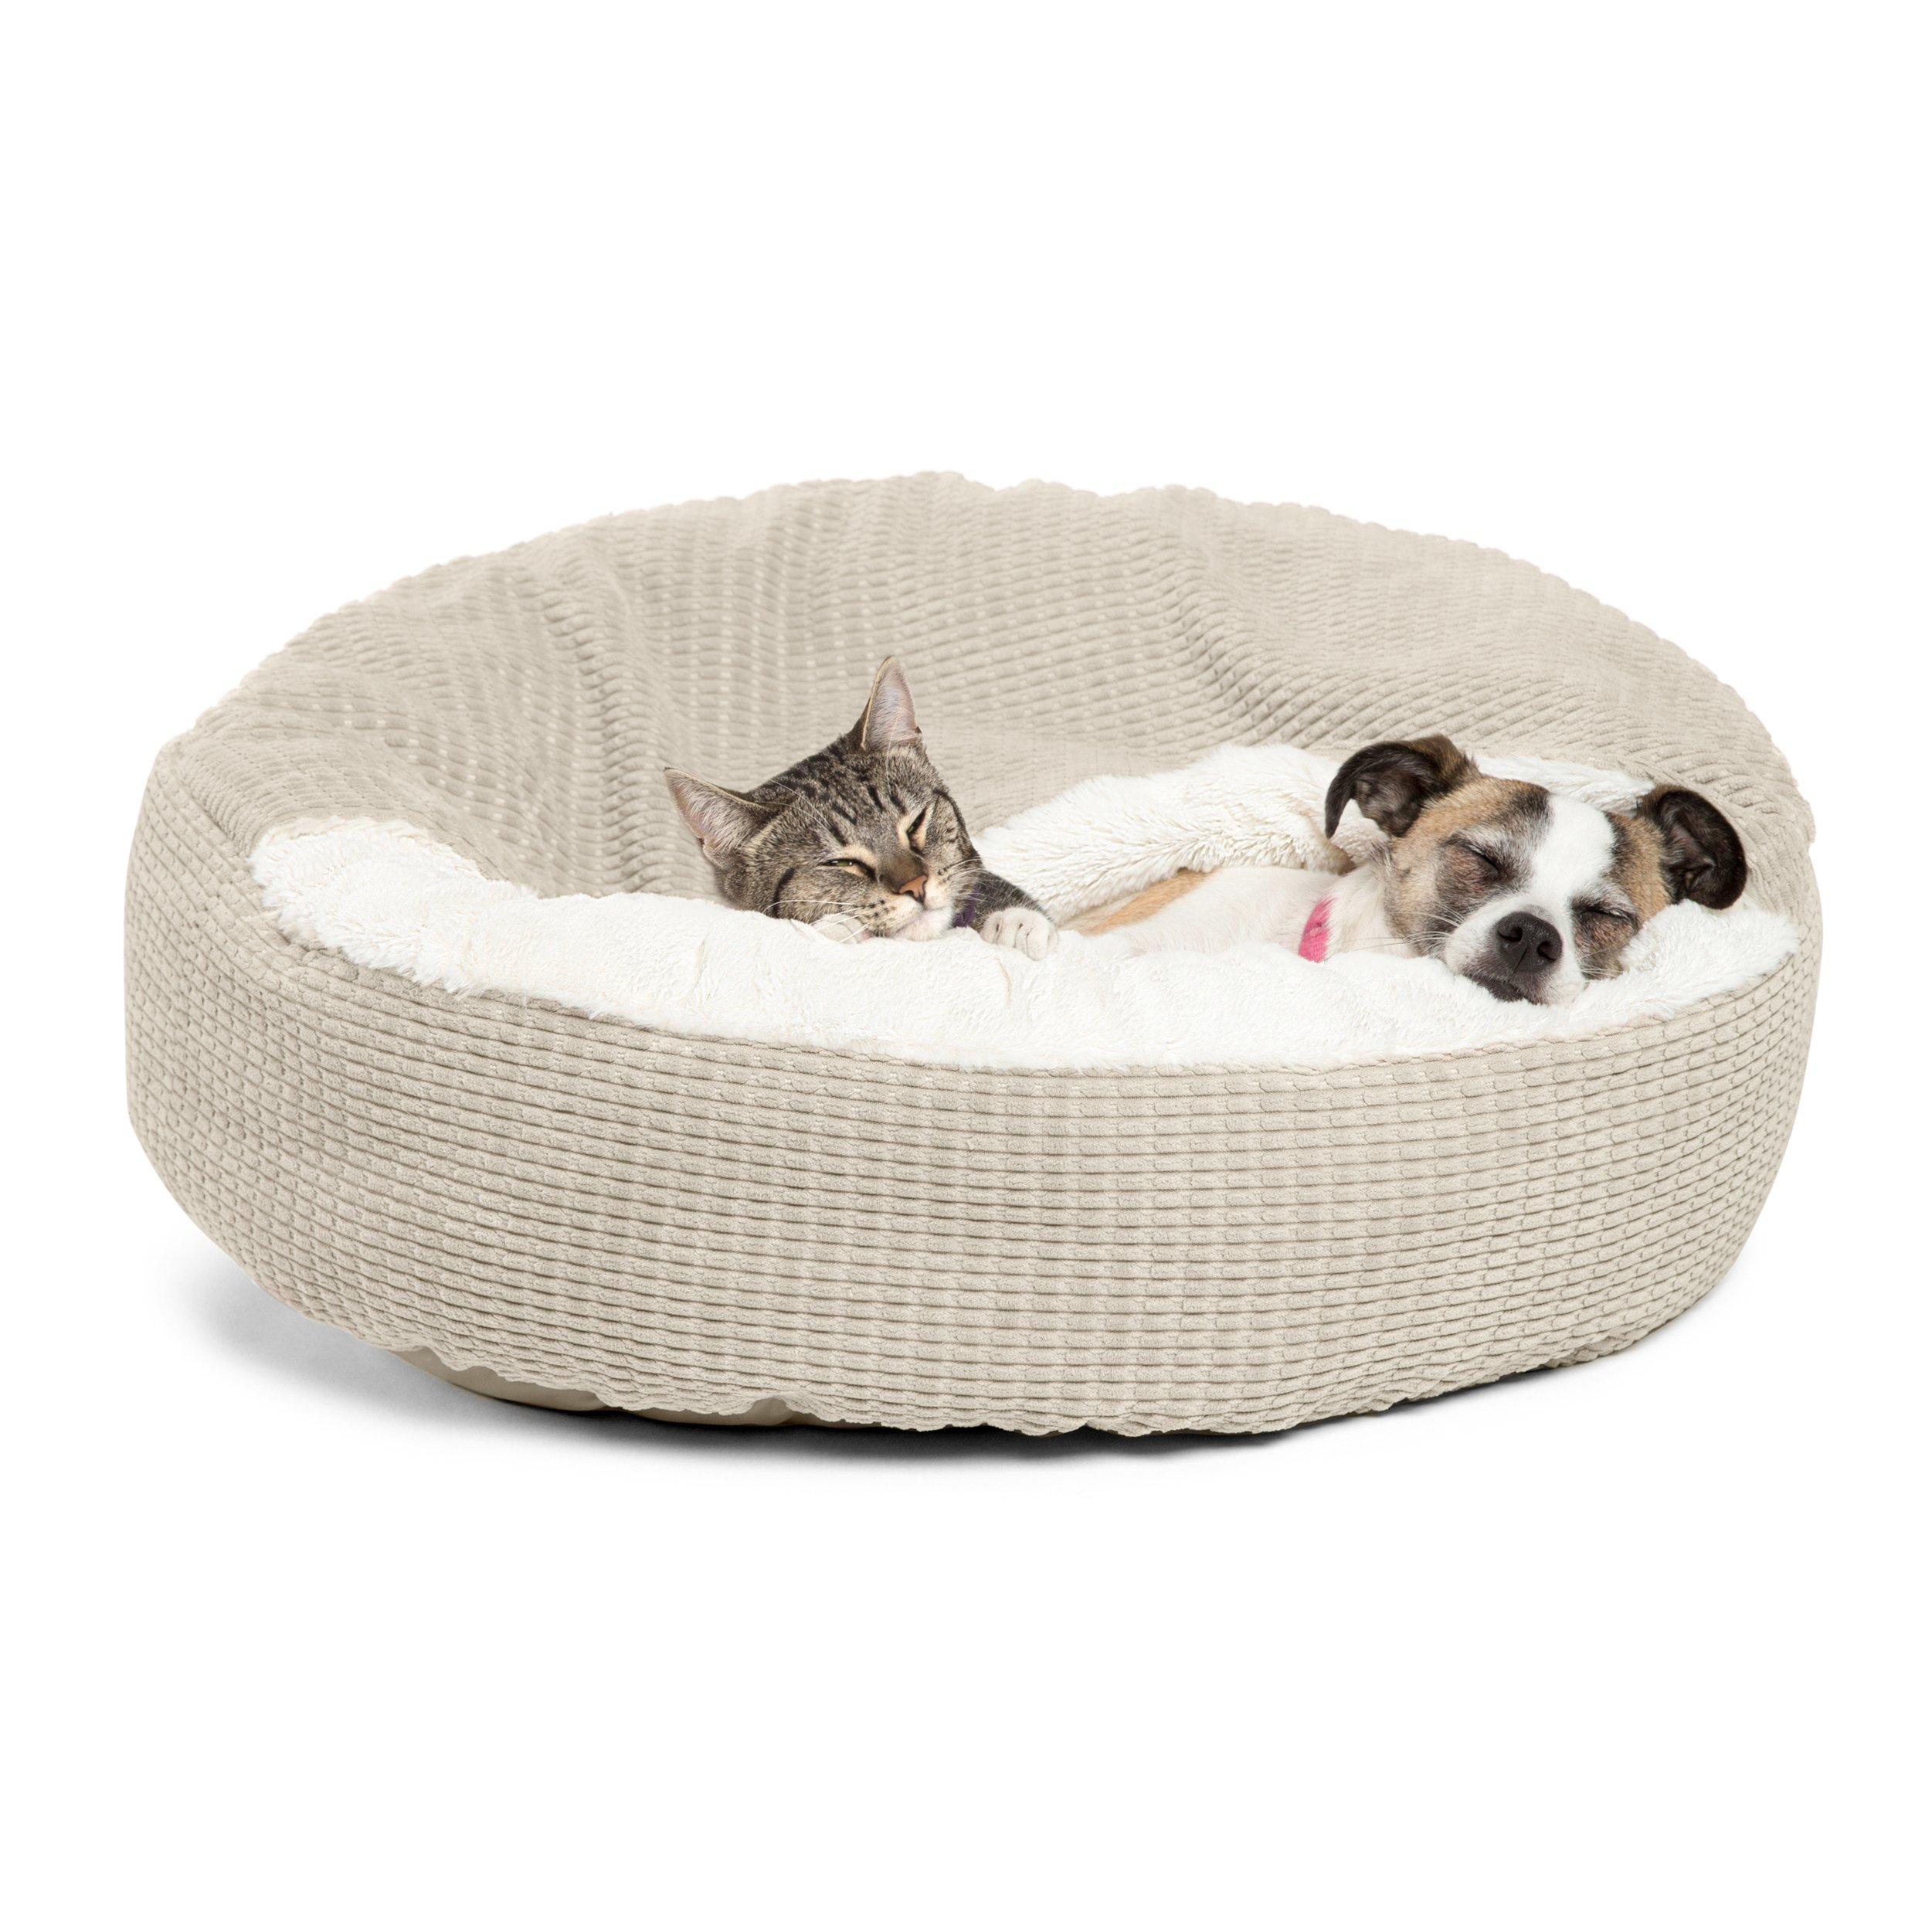 Best Friends by Sheri Cozy Cuddler in Mason Dog/Cat Bed, 26'' x 26'', Oyster